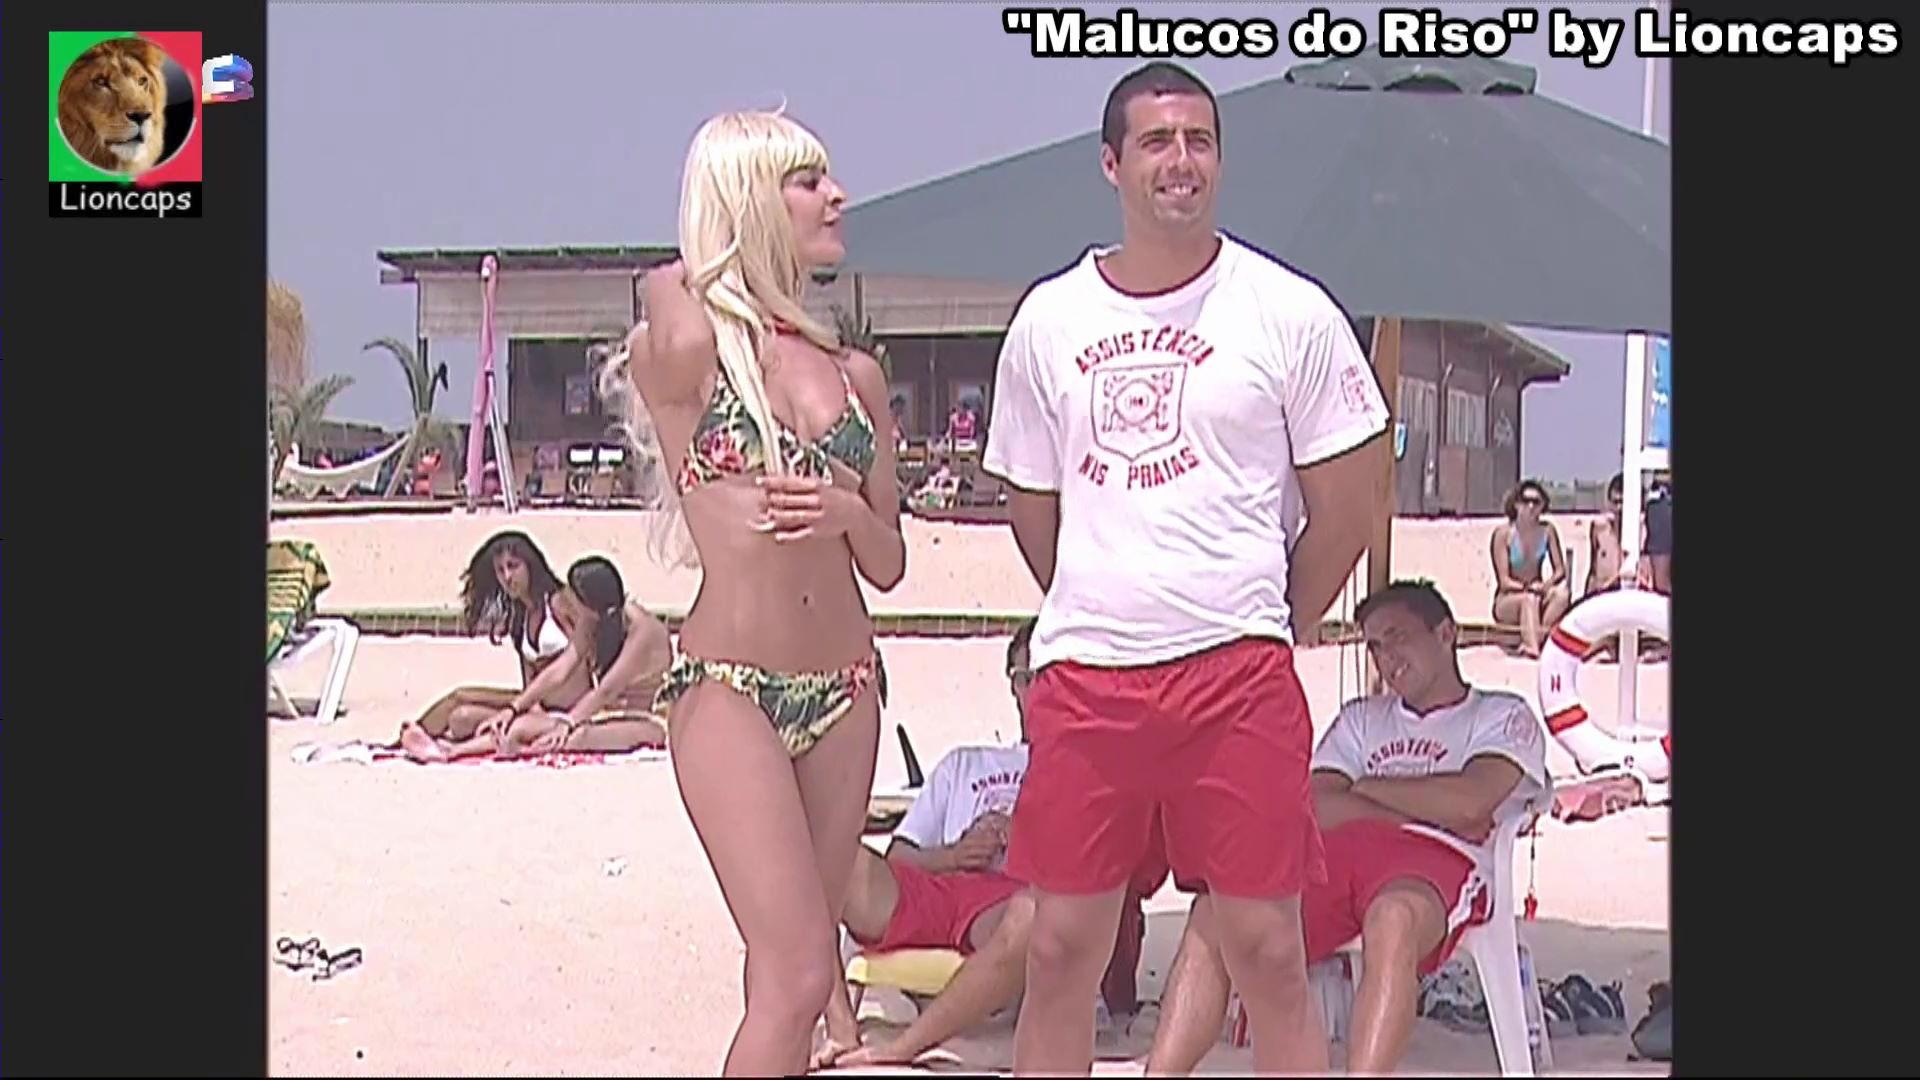 475179850_malucos_riso_alda_gomes_vs190malucos_riso_602_15082_122_196lo.JPG